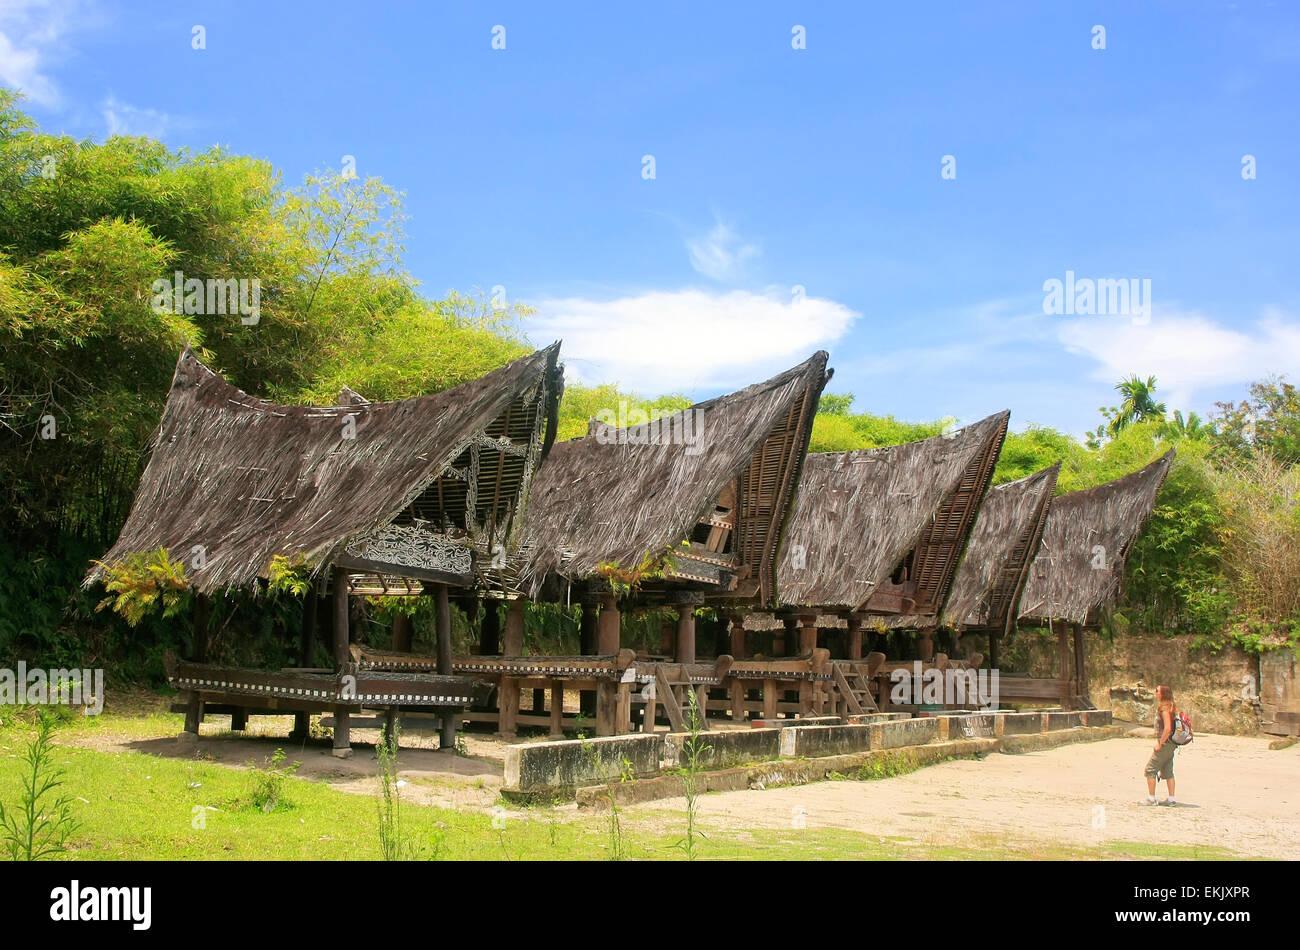 Traditional Batak houses on Samosir island, Sumatra, Indonesia, Southeast Asia - Stock Image